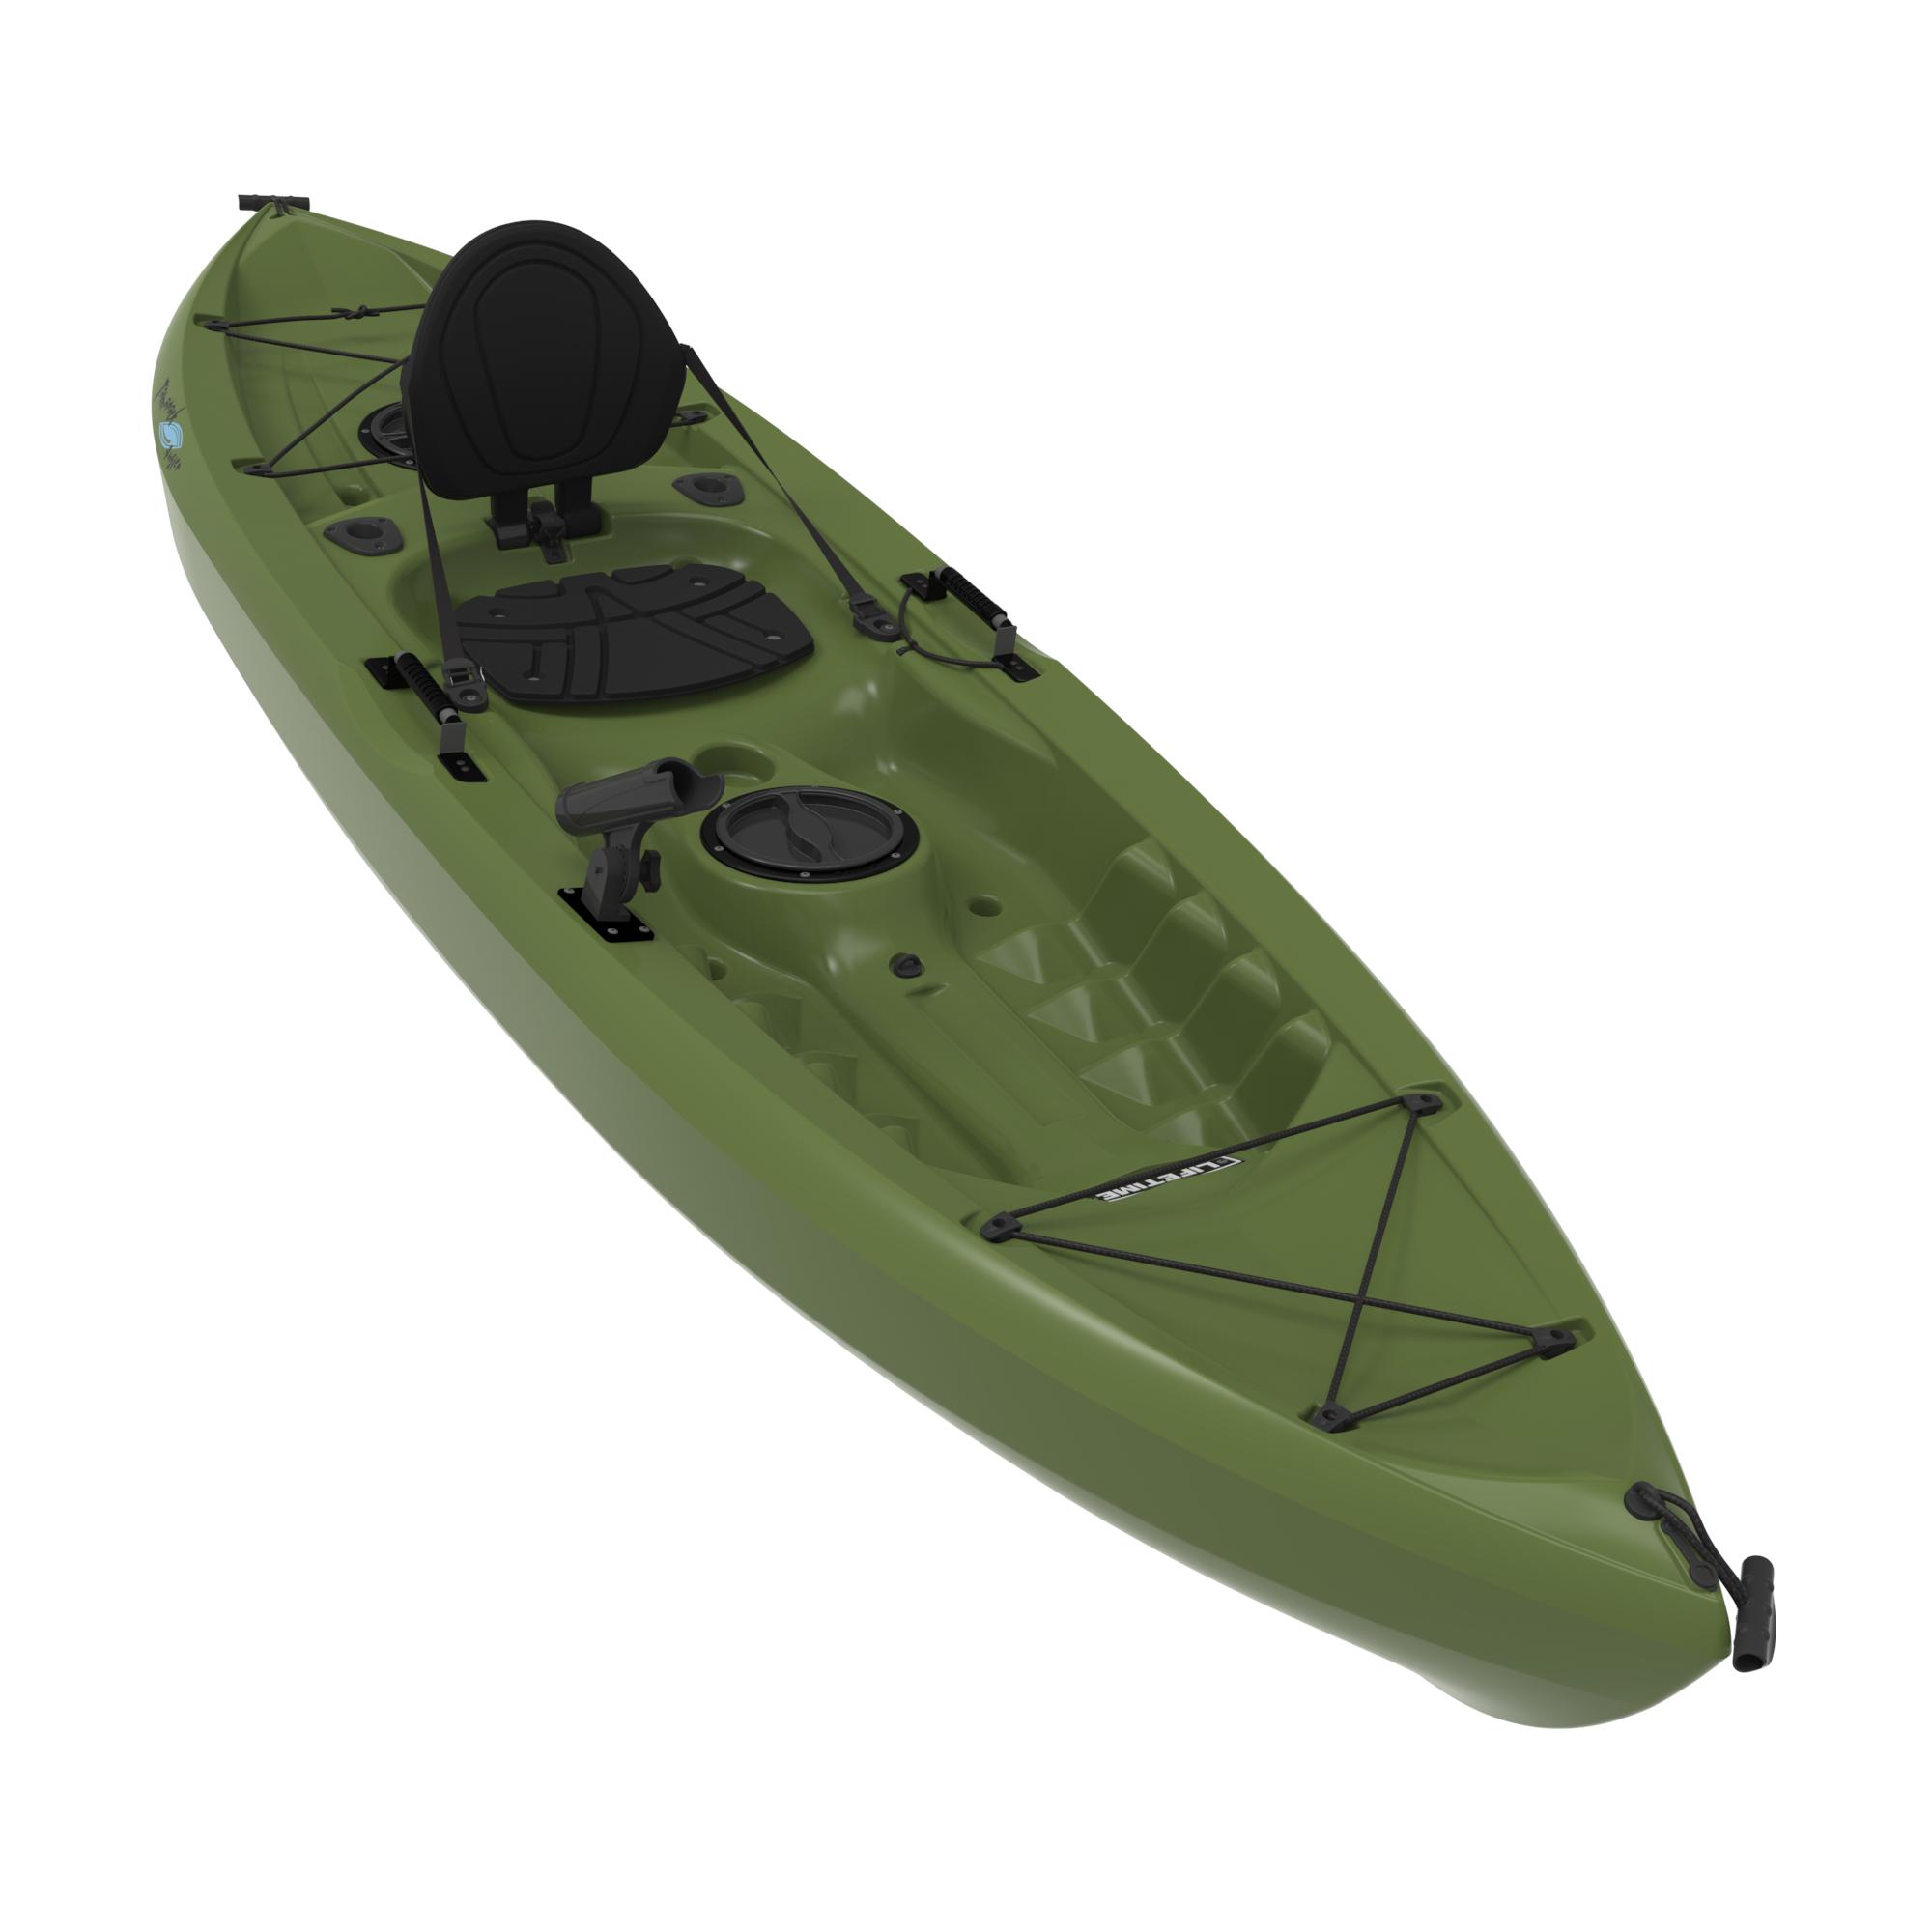 Lifetime Olive Angler Kayak On Sale Free Shipping Amp Free